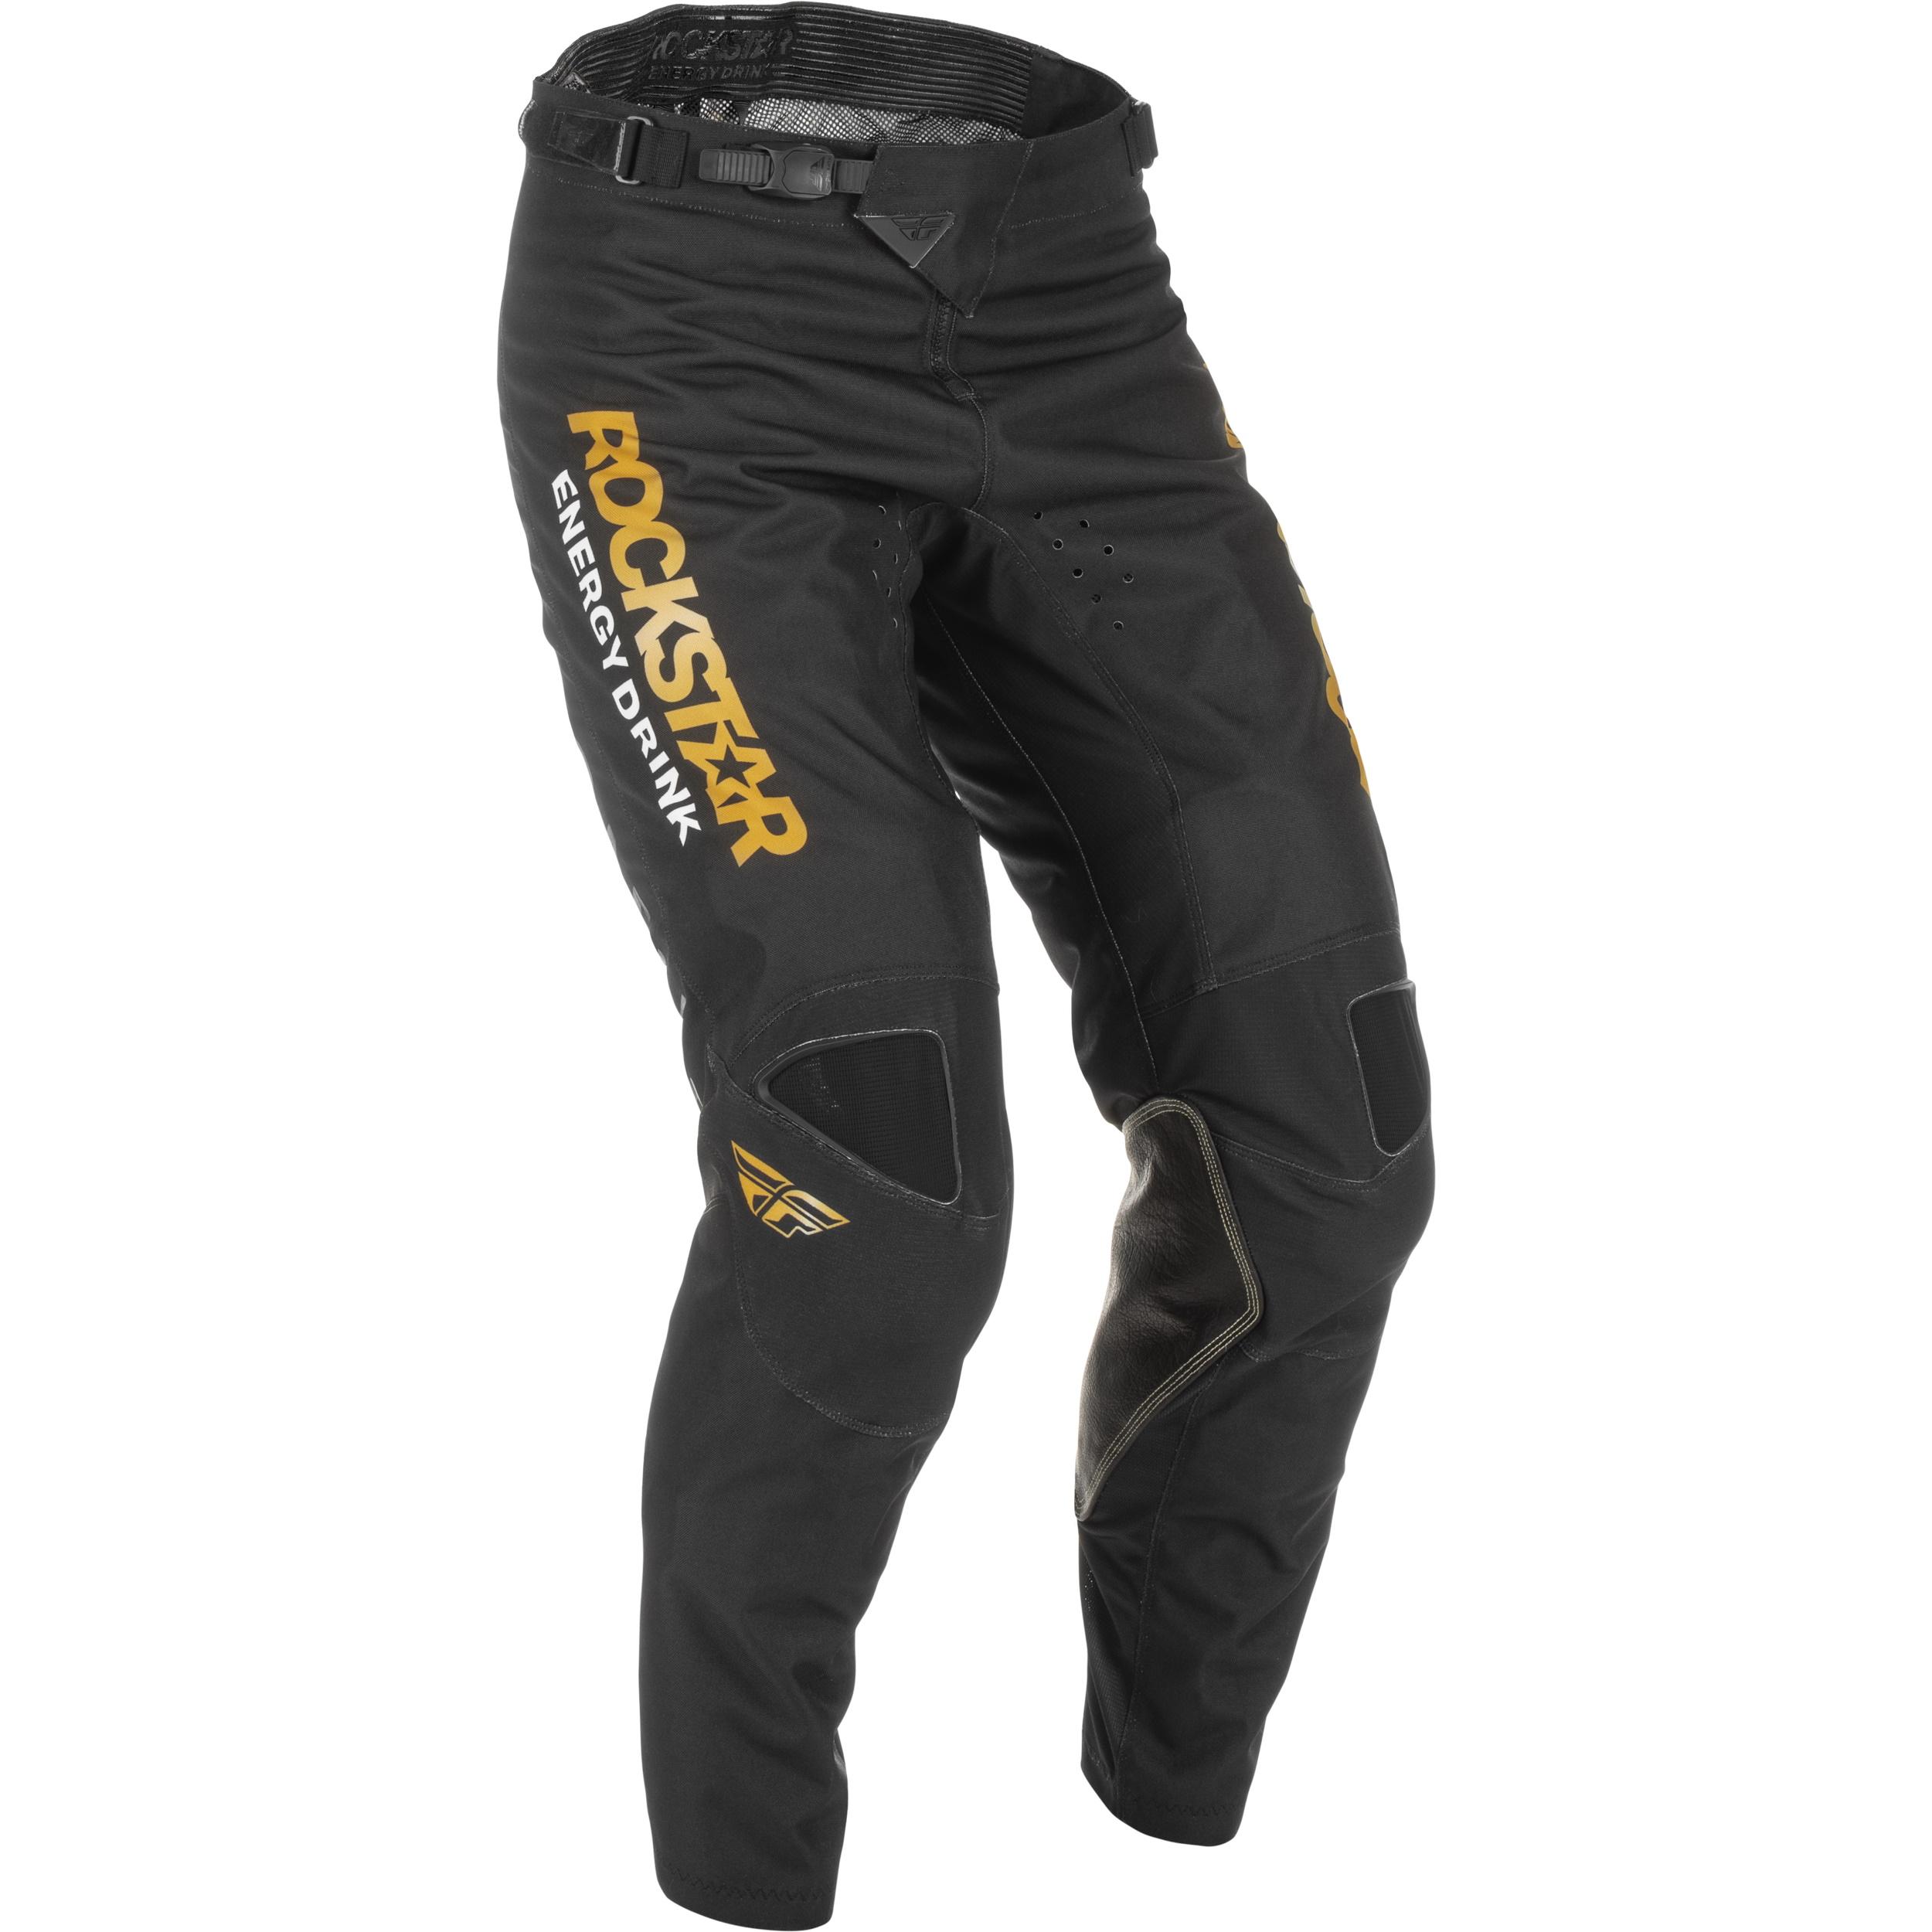 Fly Racing 2022 Kinetic Rockstar Black/Gold Pants